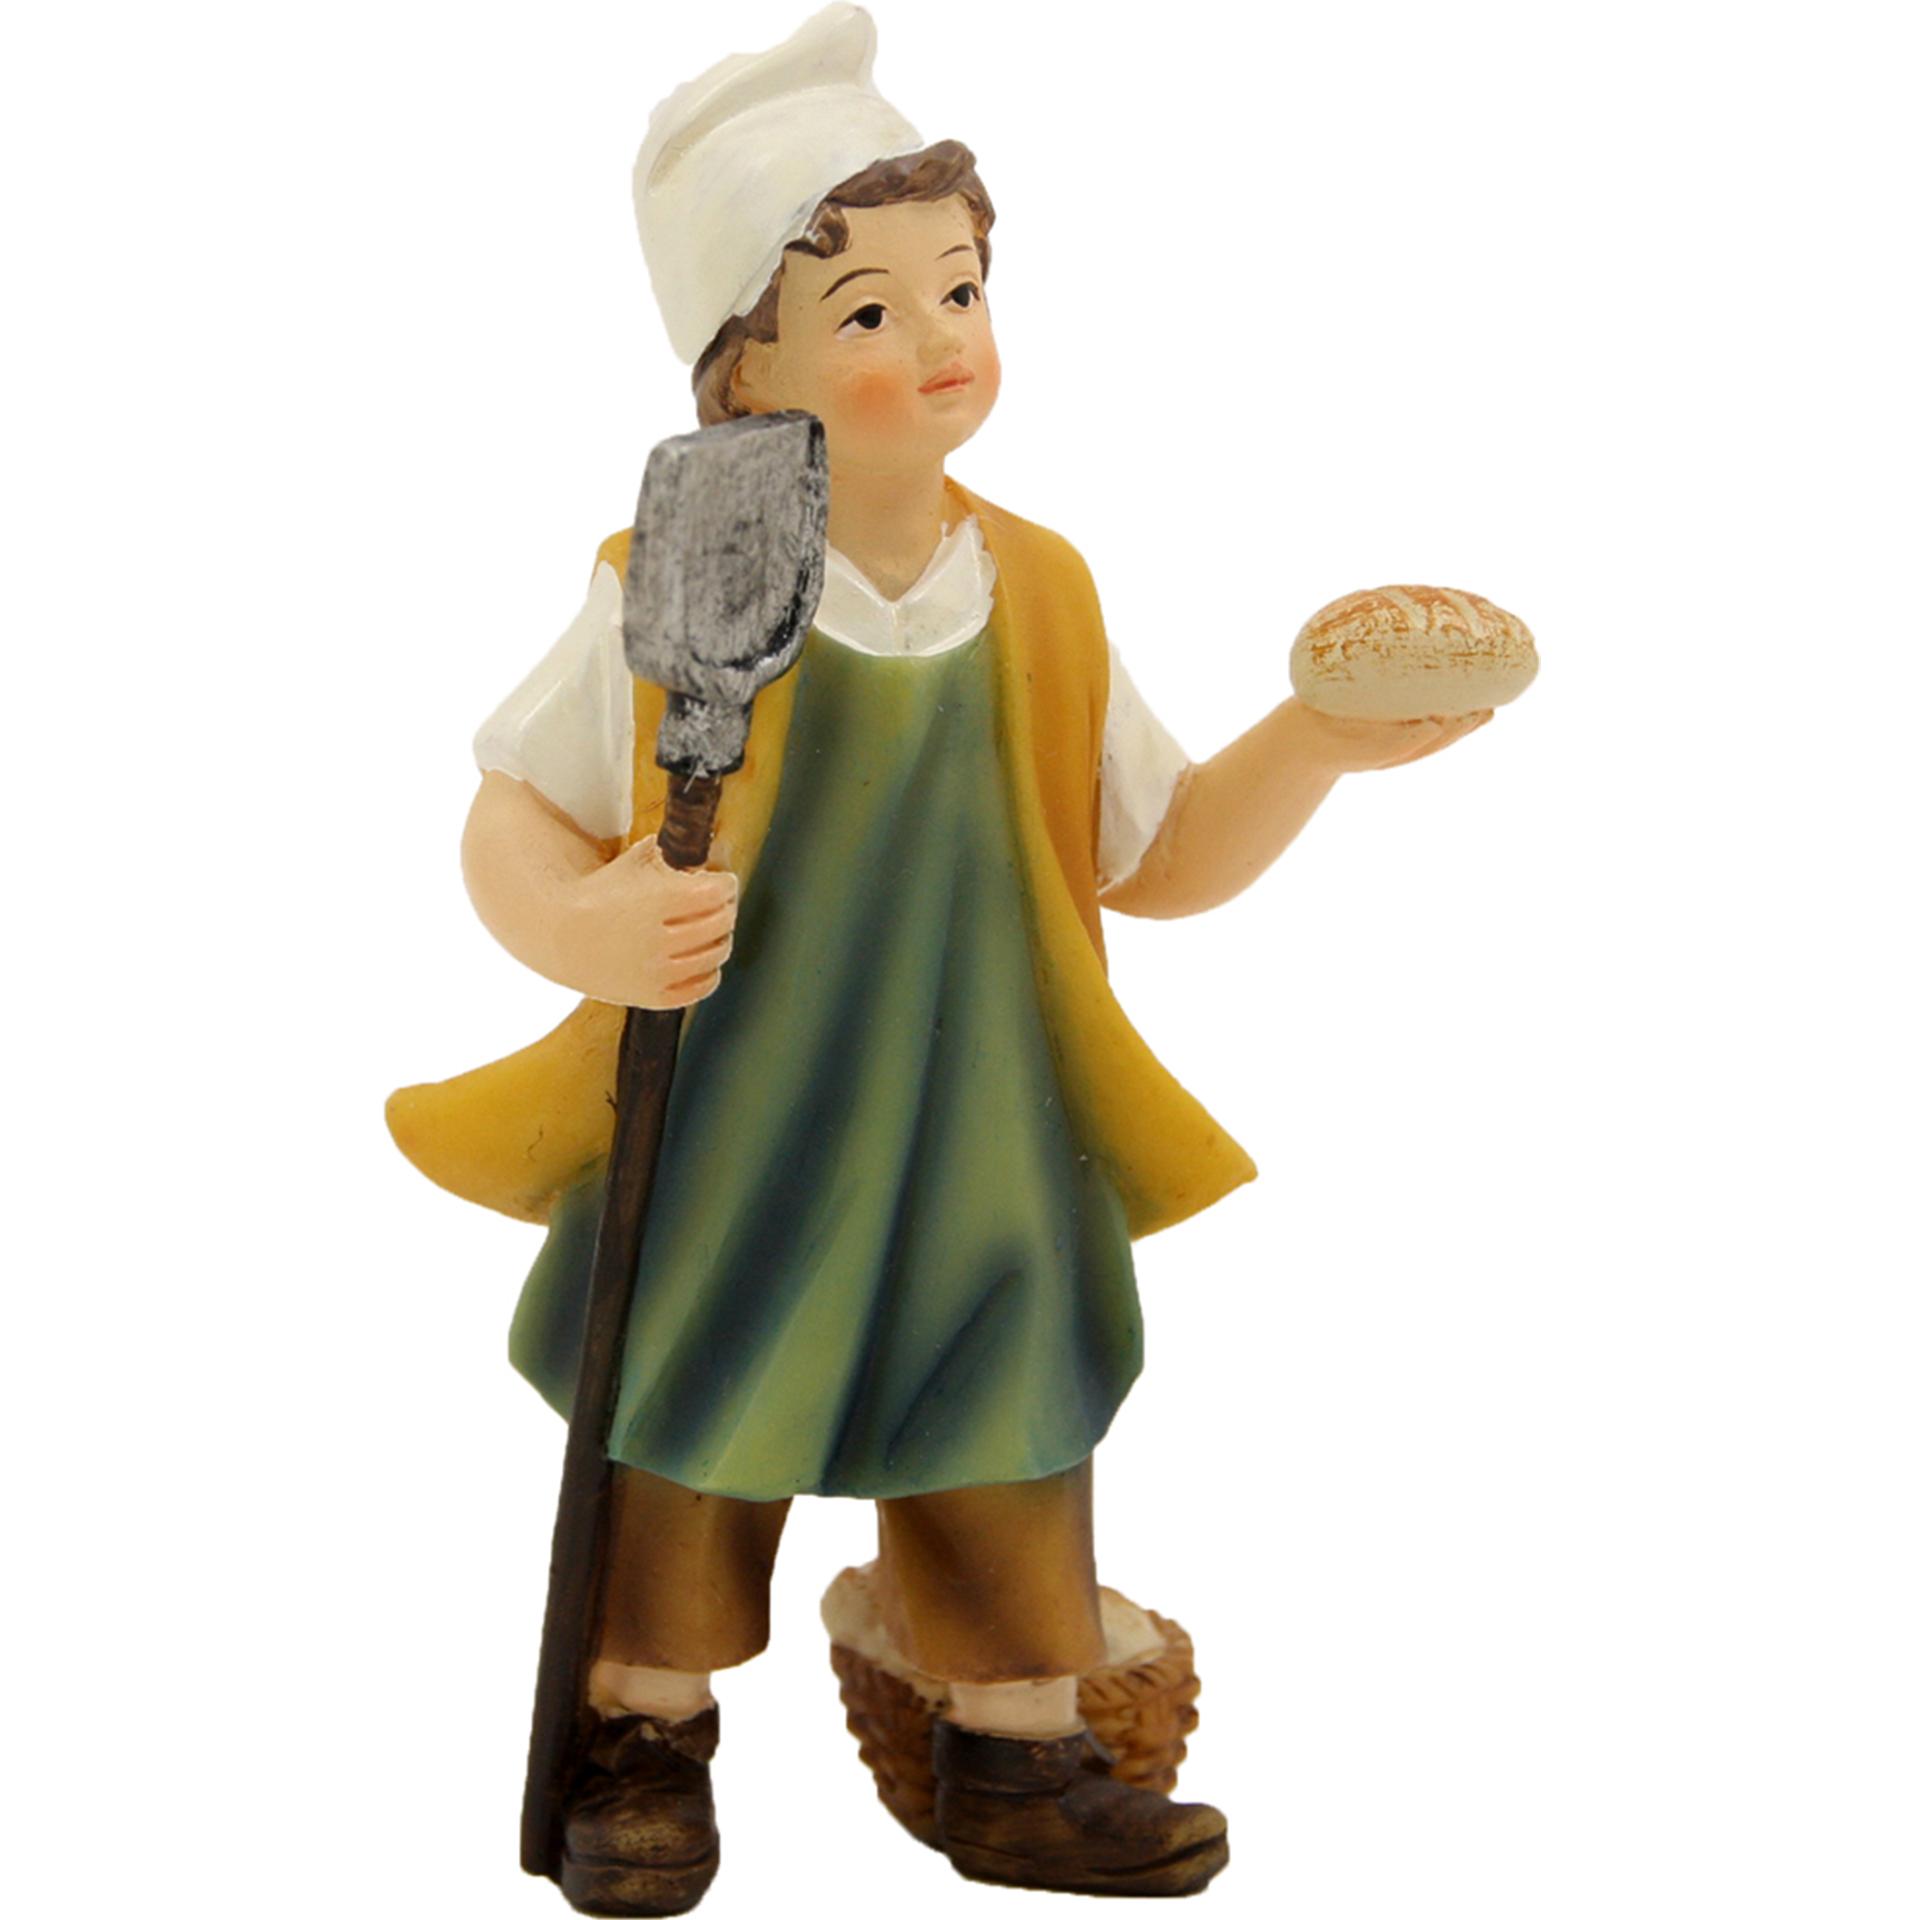 Bäcker Krippe Zusatzfigur